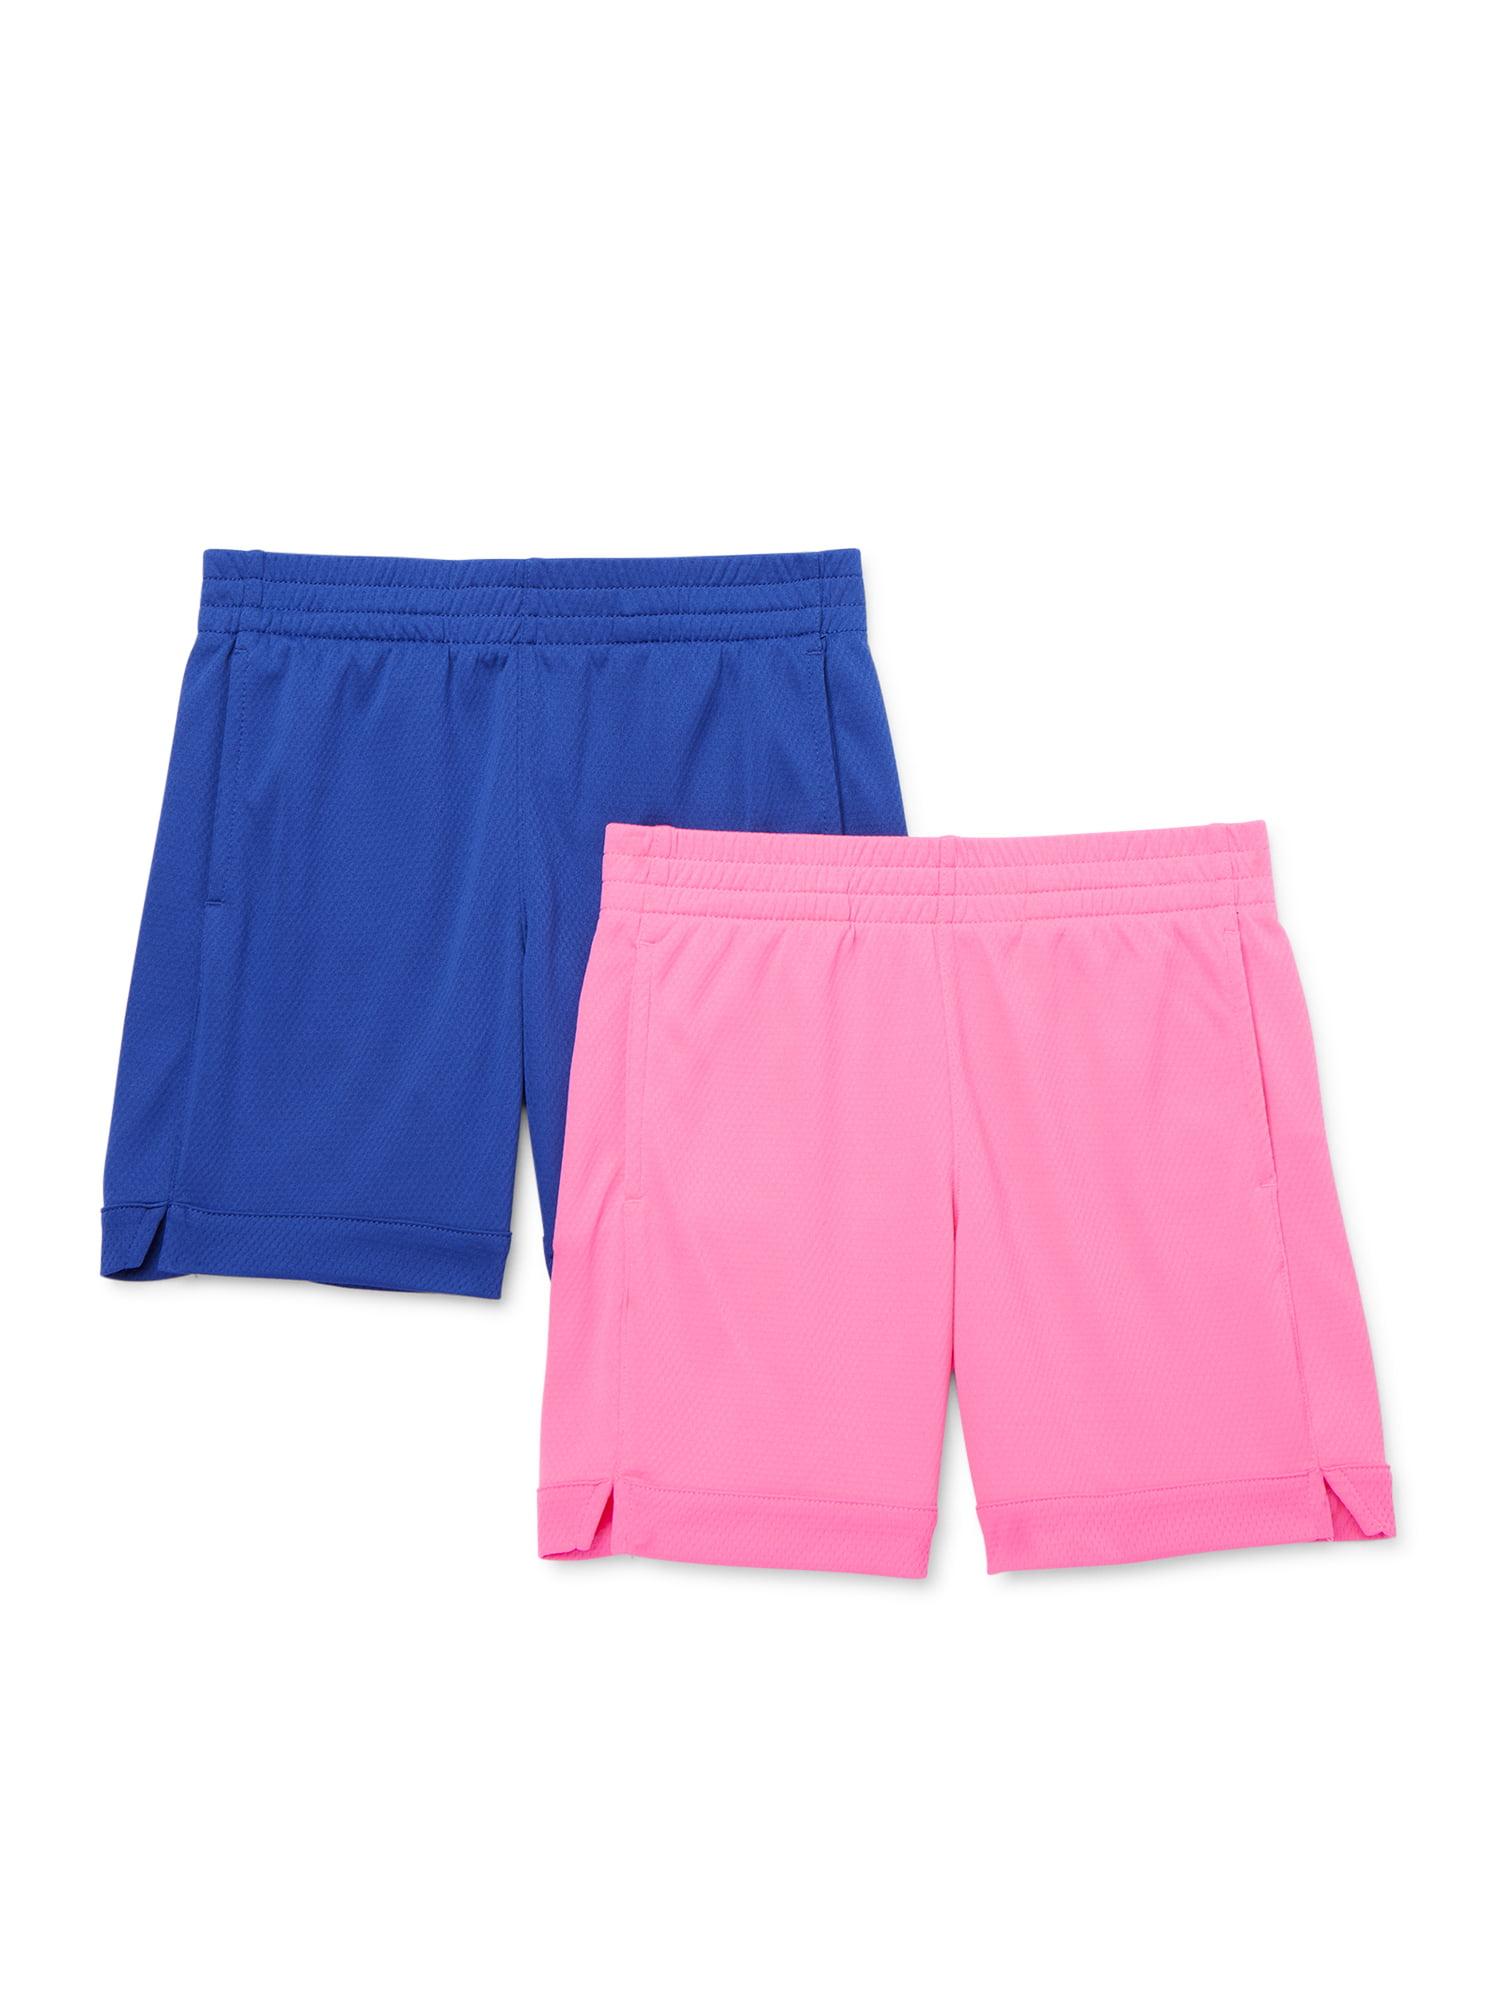 Athletic Works - Athletic Works Girls Active Mesh Soccer Shorts, 2-Pack,  Sizes 4-18 & Plus - Walmart.com - Walmart.com